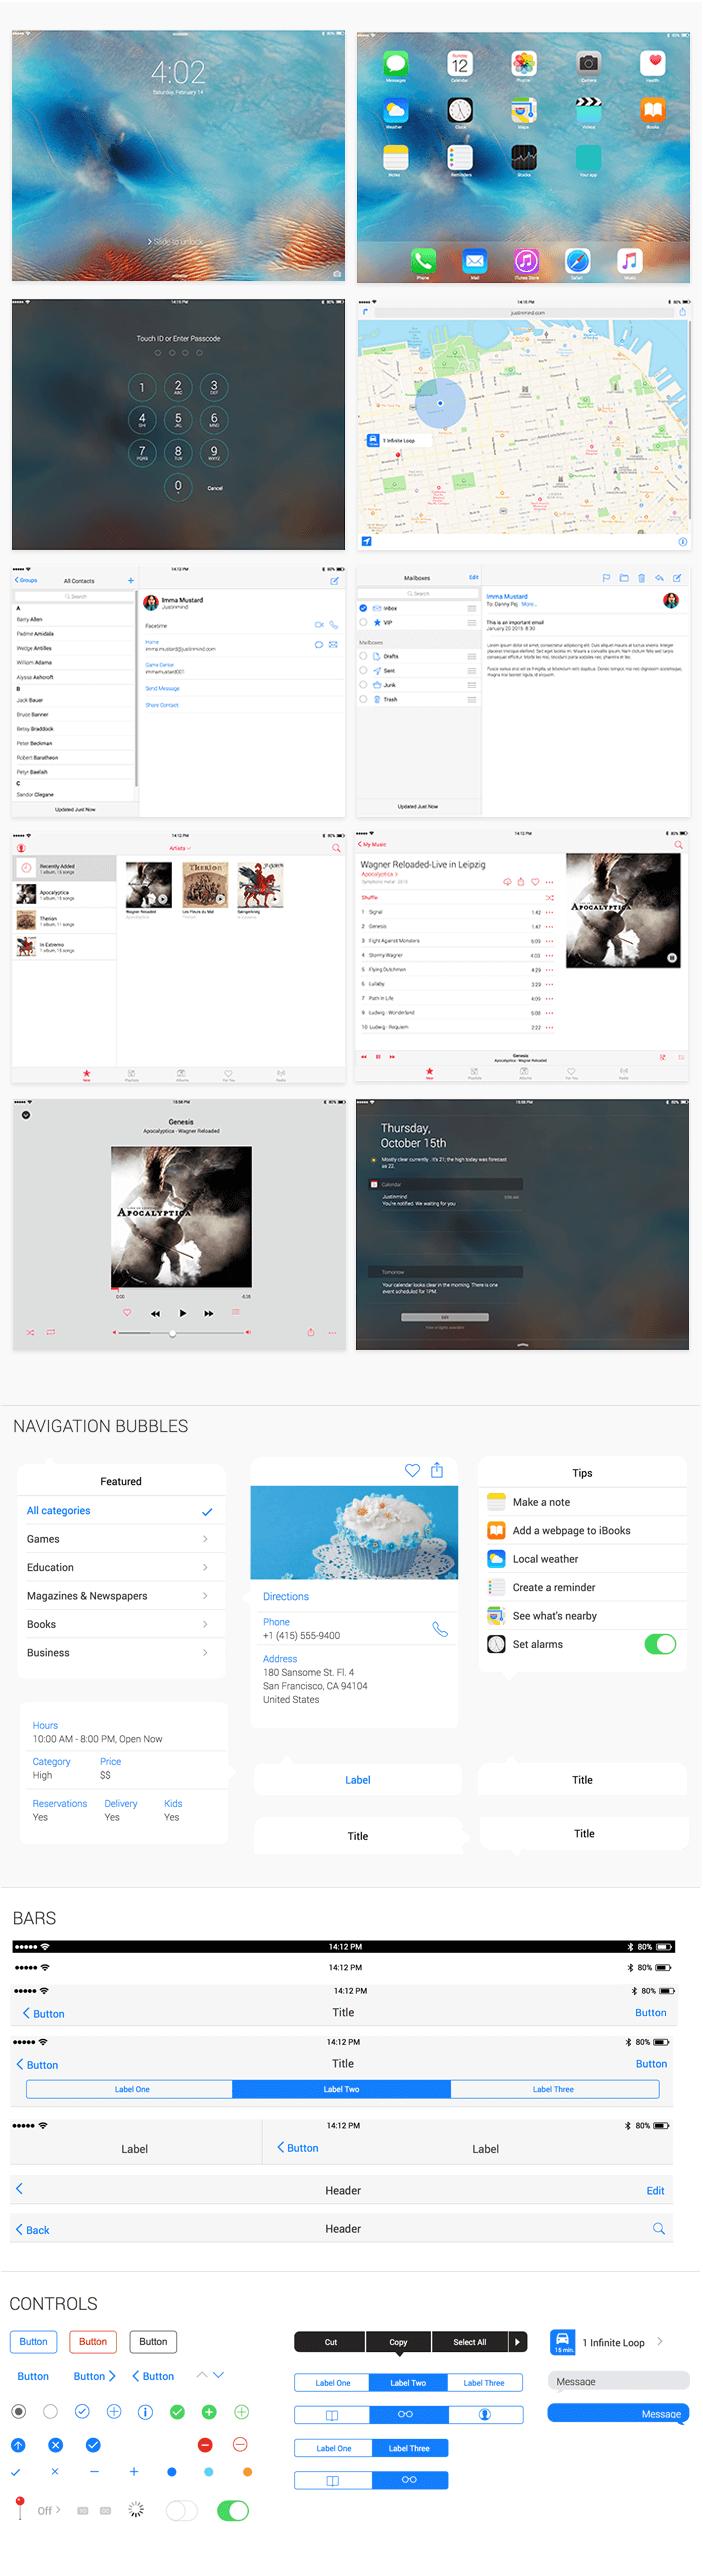 ios9-ipad-uikit-images-UI-assets